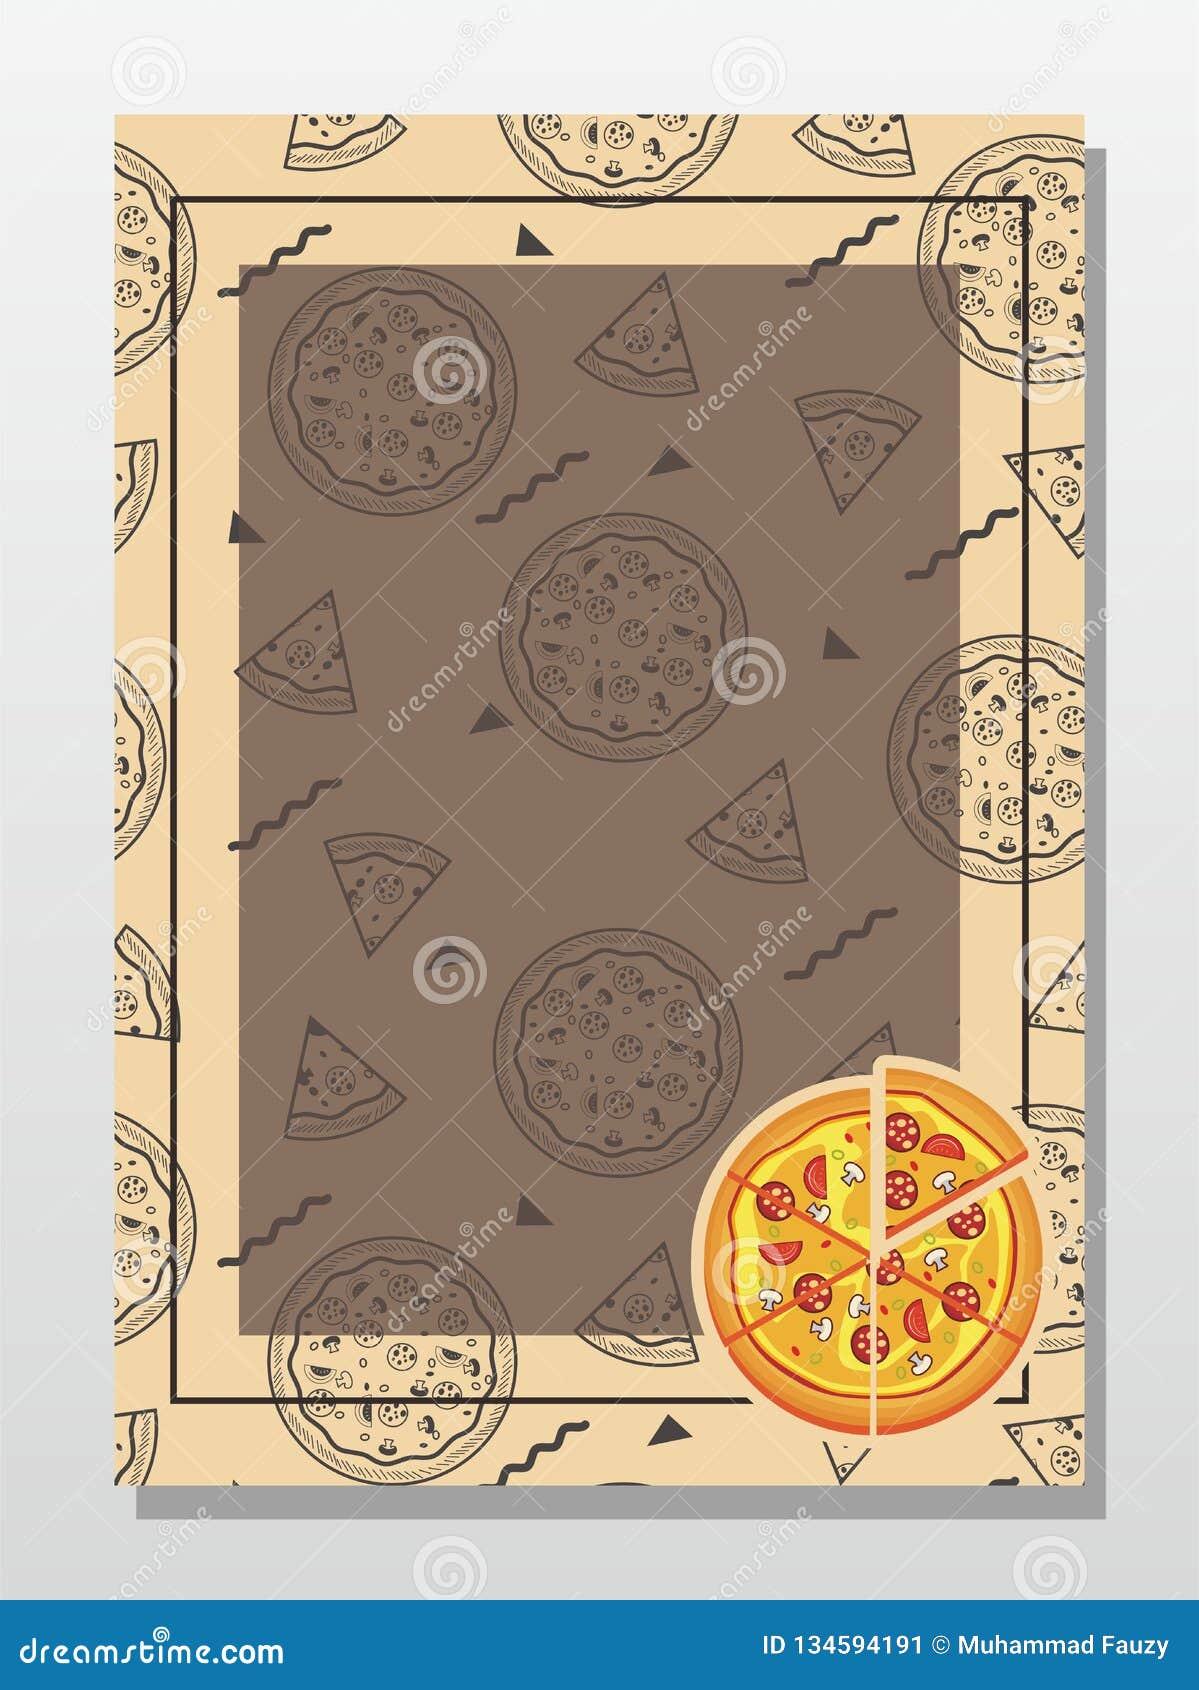 pizza background template for menucardposter design